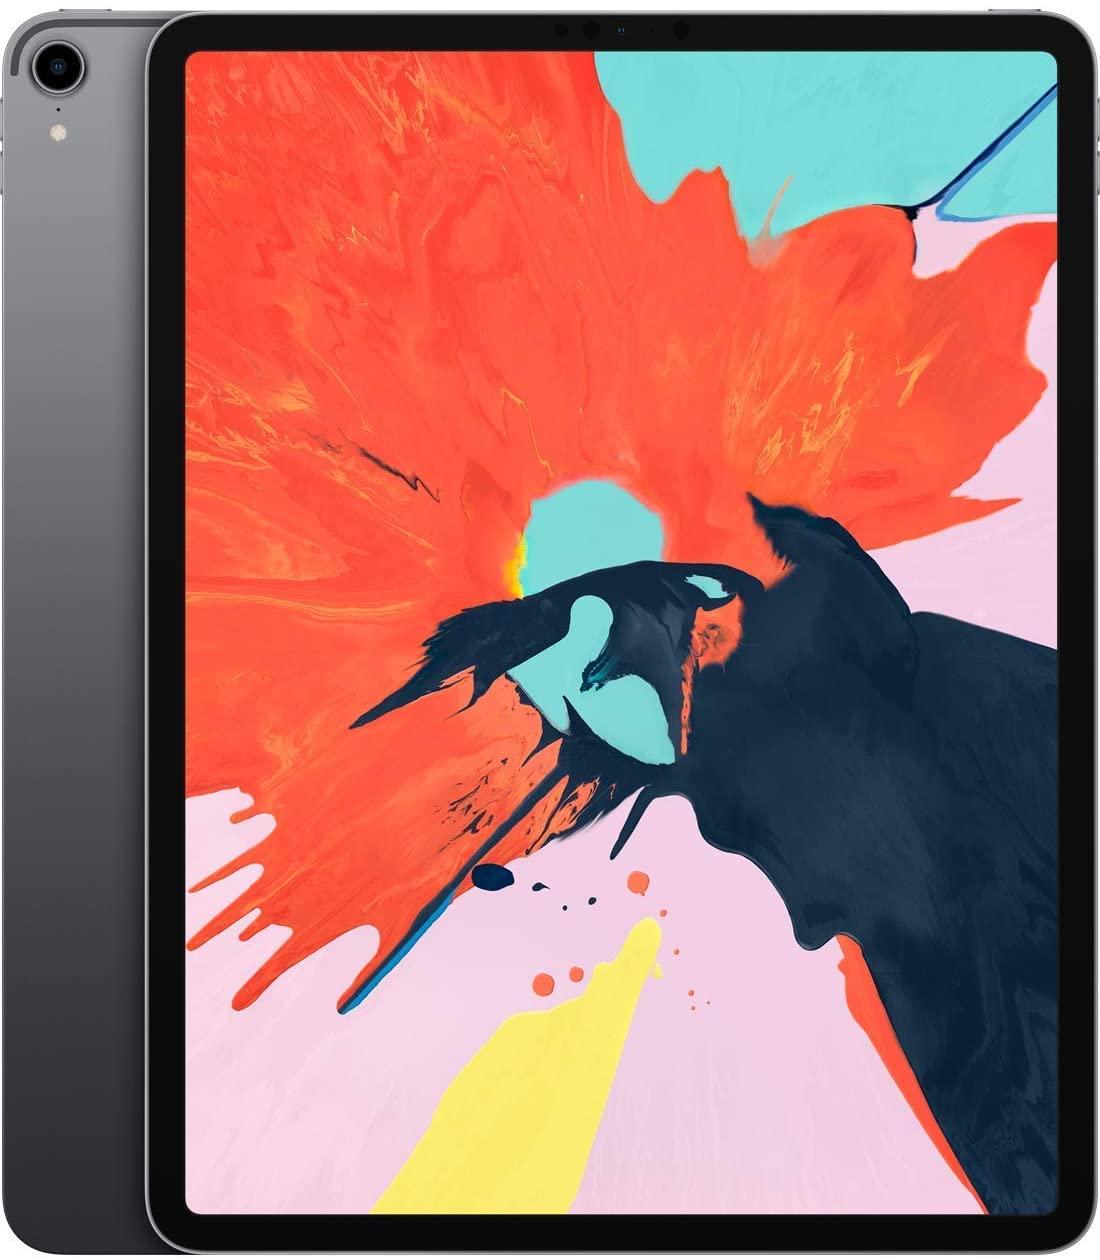 iPad Pro 12.9 (3rd Generation)